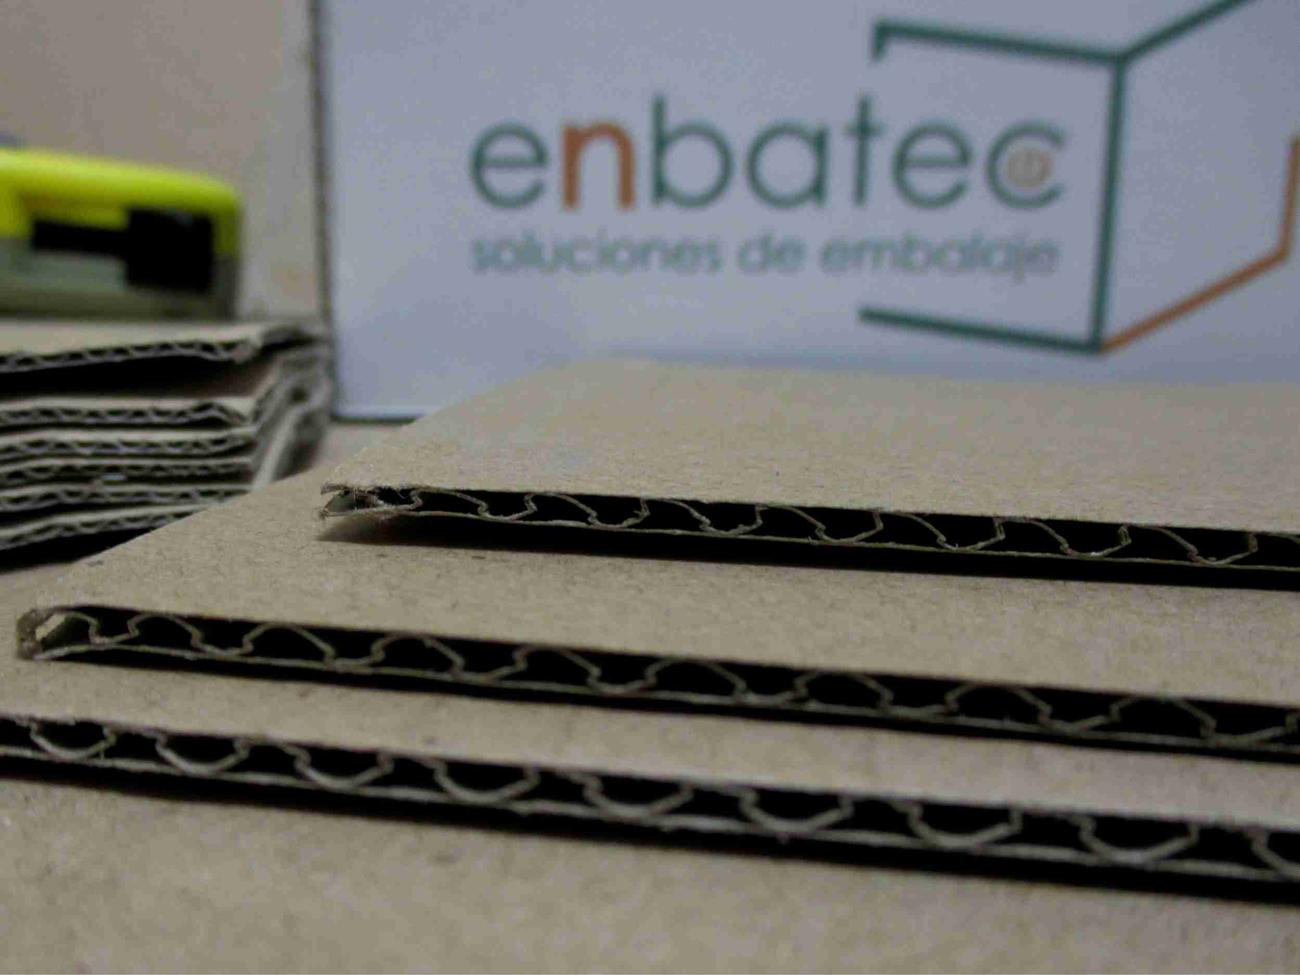 Enbatec, blog